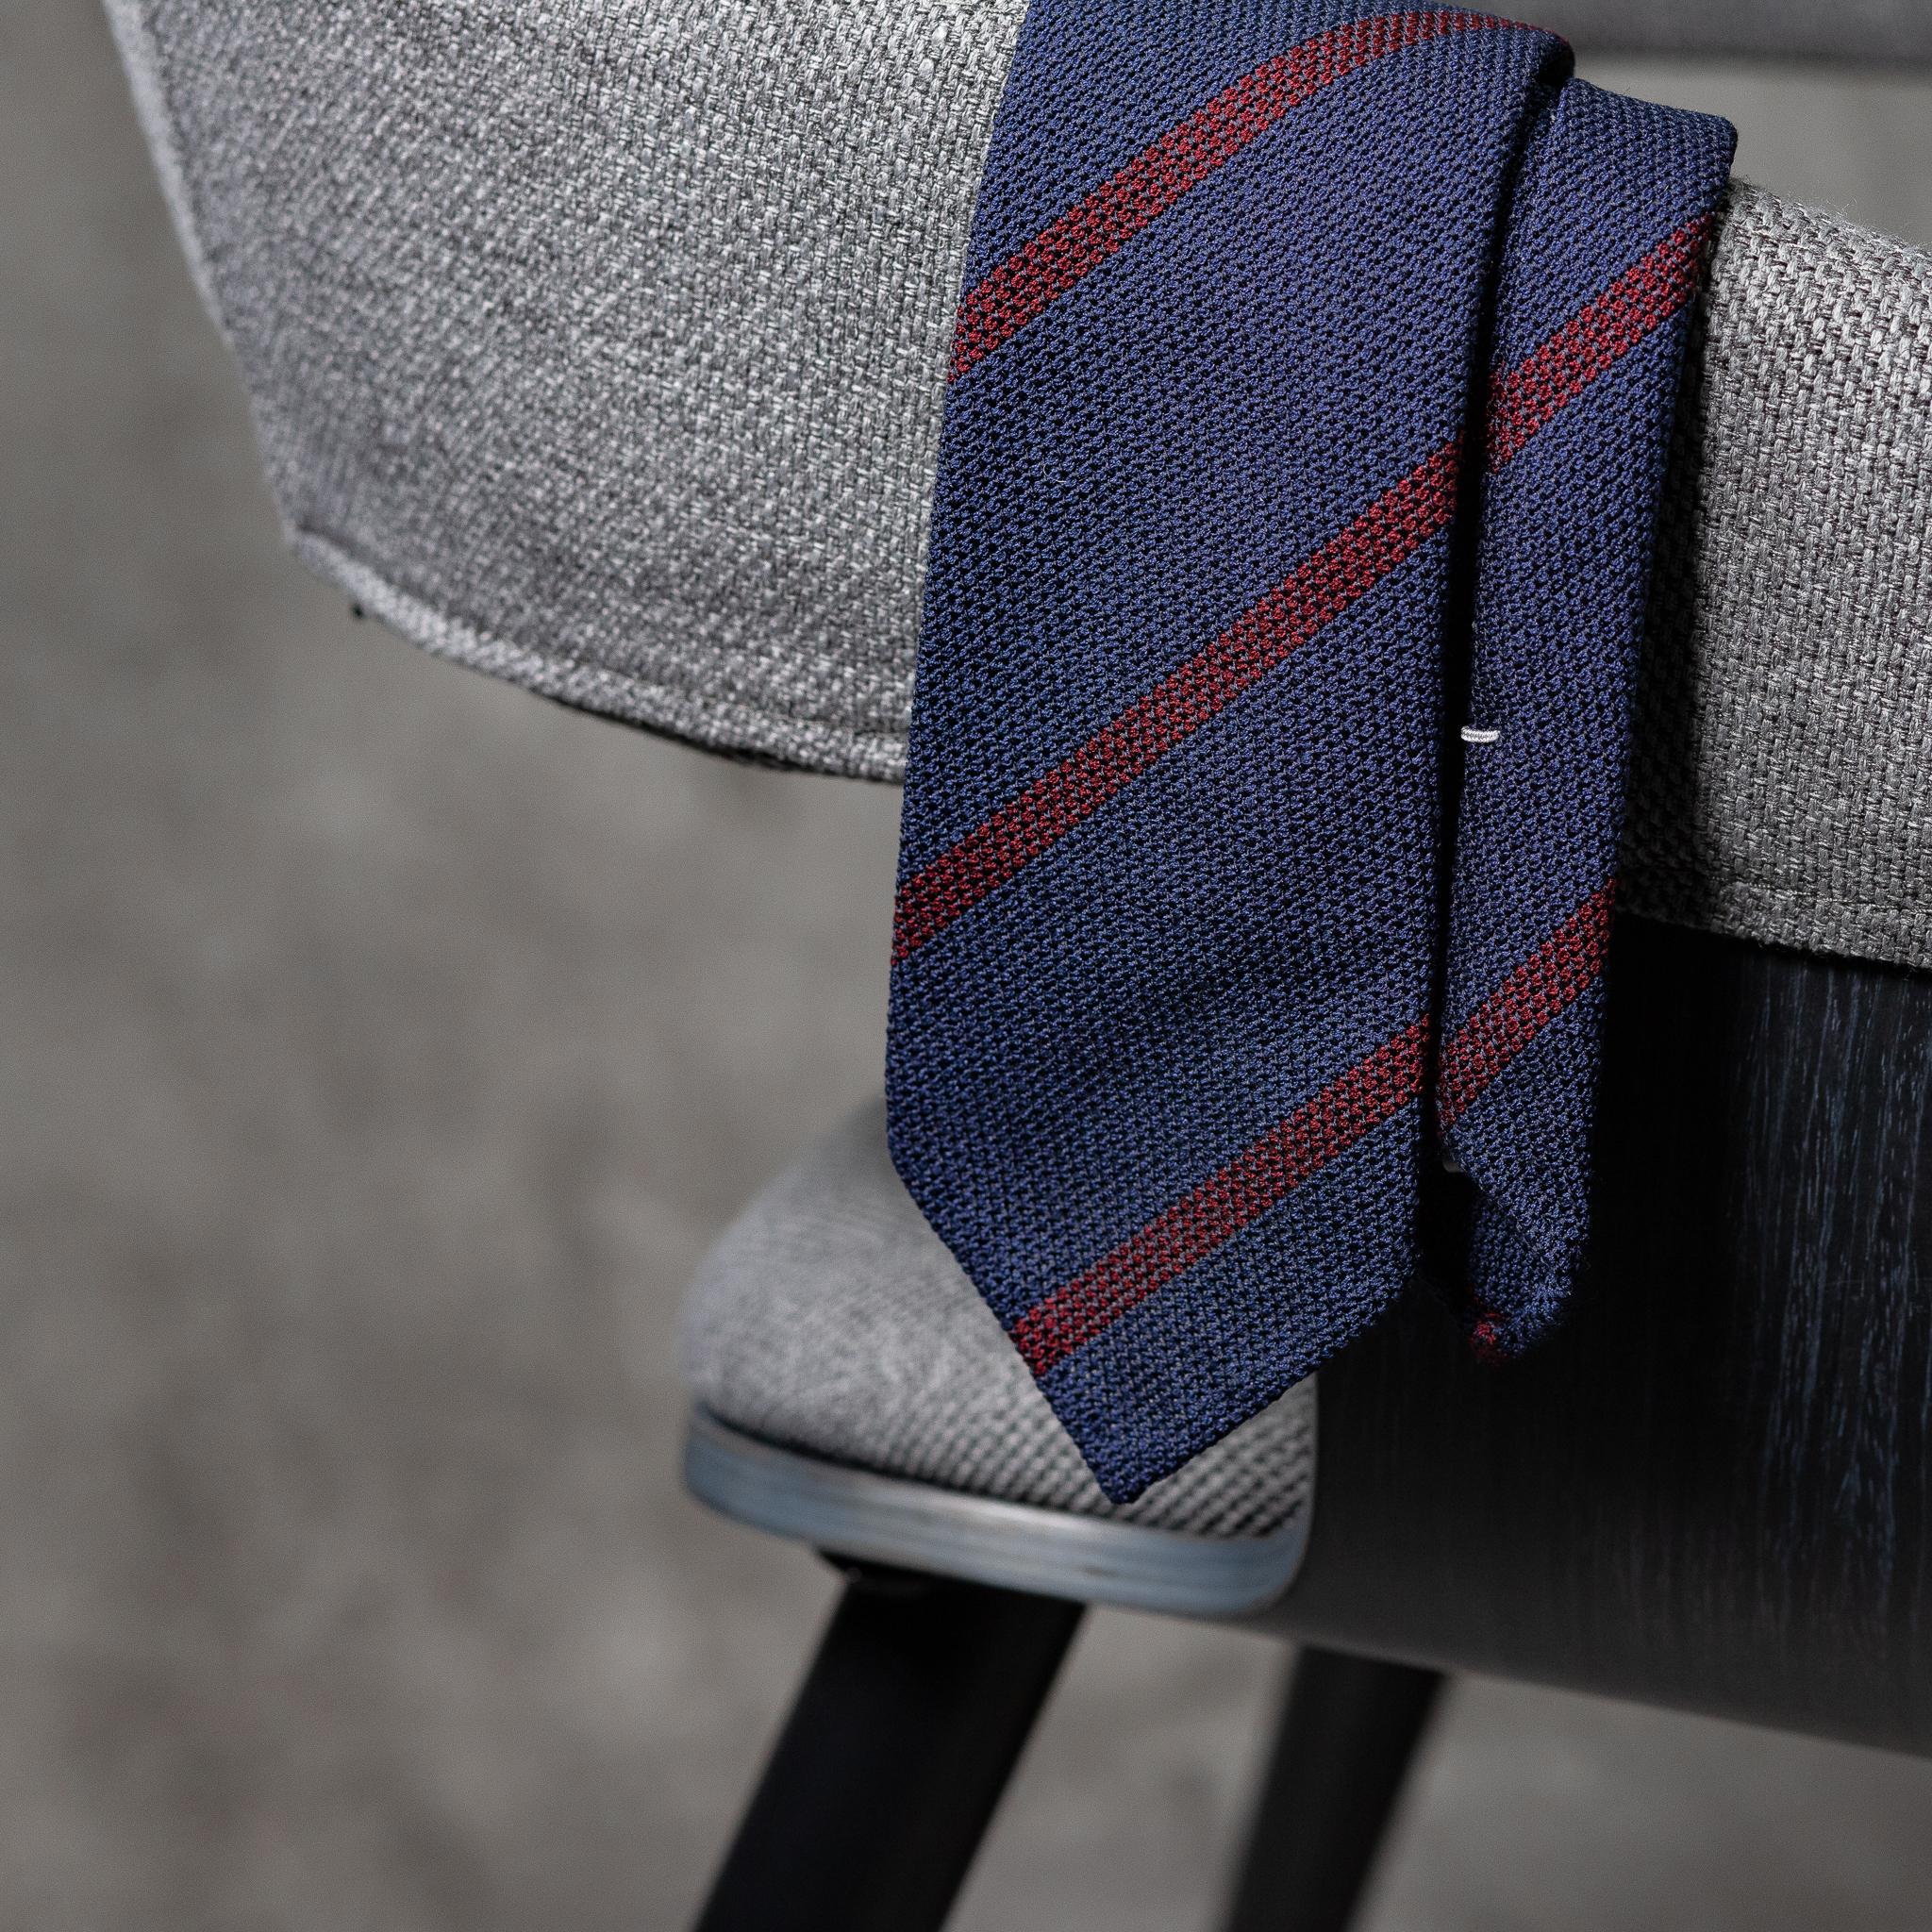 BOUCLÉ-0535-Tie-Initials-Corbata-Iniciales-The-Seelk-2